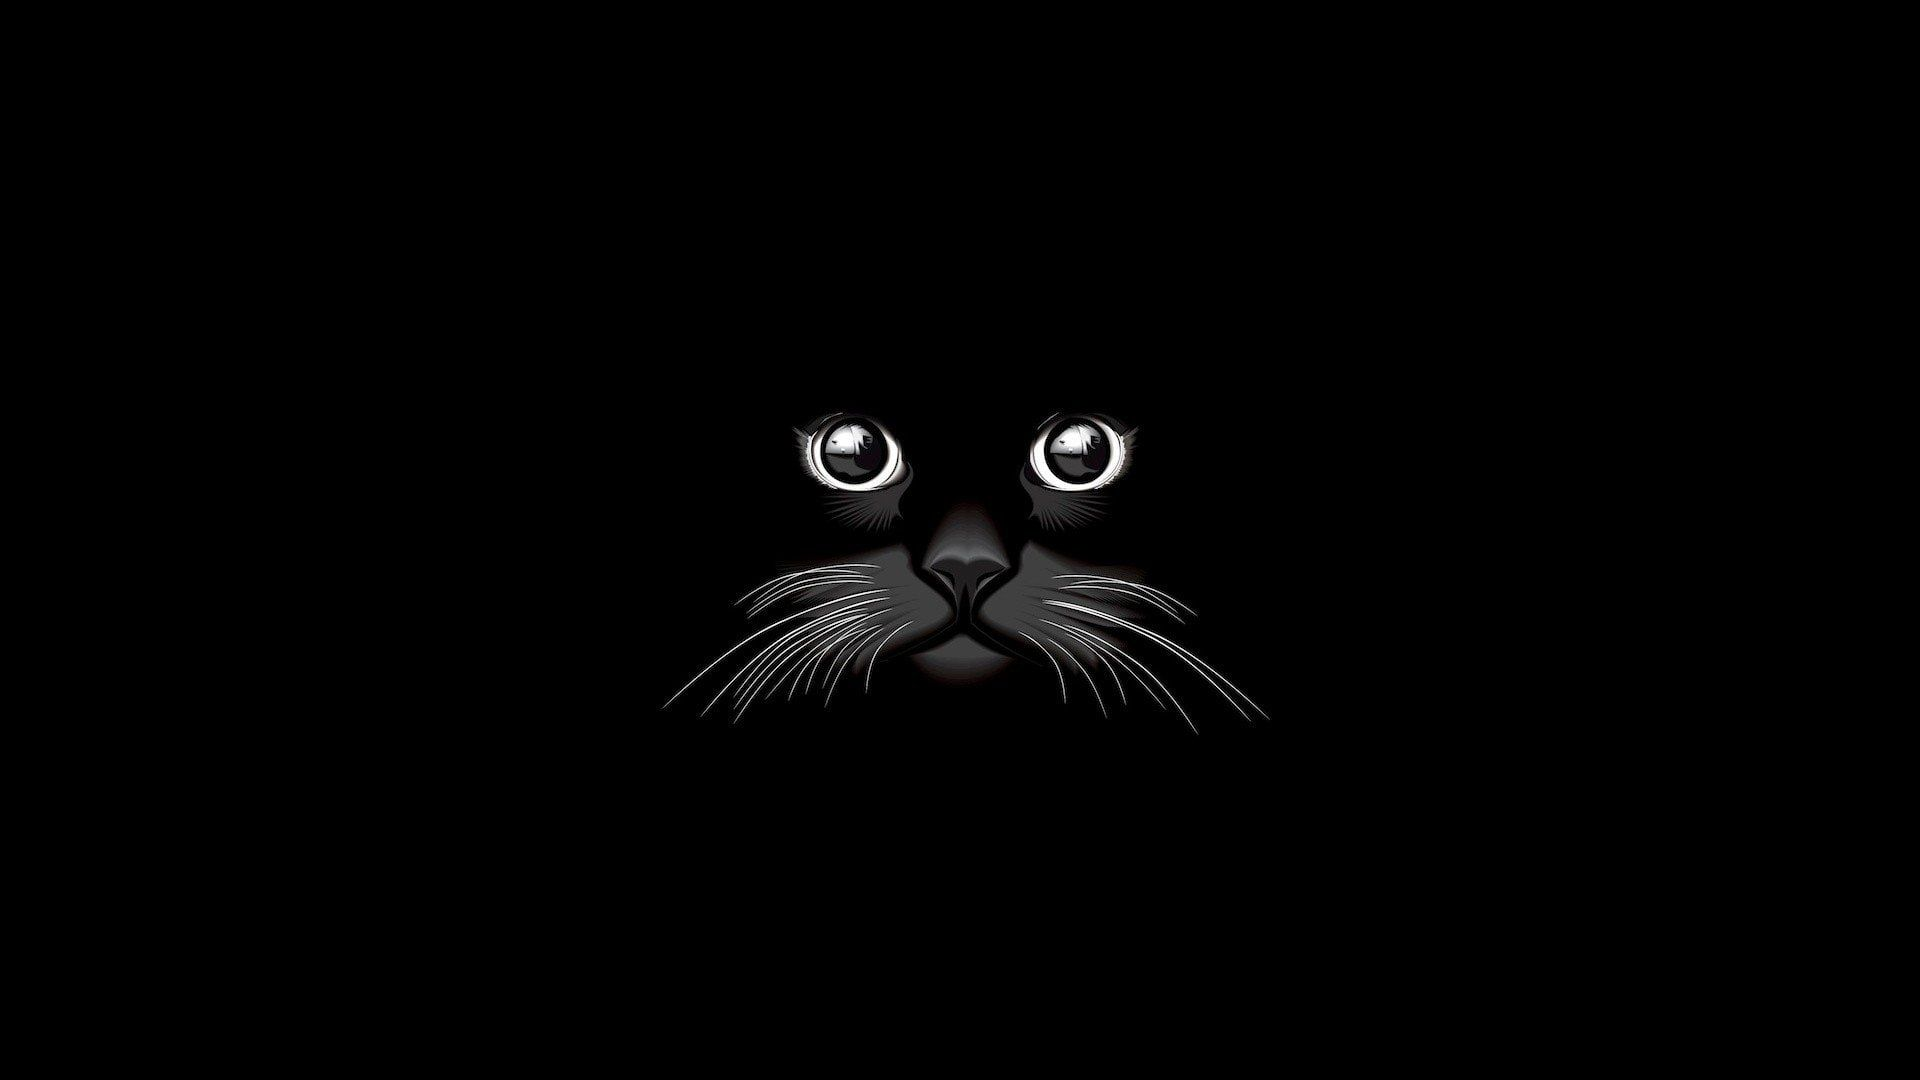 Artistic Vector Black Cat Minimalist 1080p Wallpaper Hdwallpaper Desktop Cat Vector Minimalist Wallpaper Artistic Wallpaper